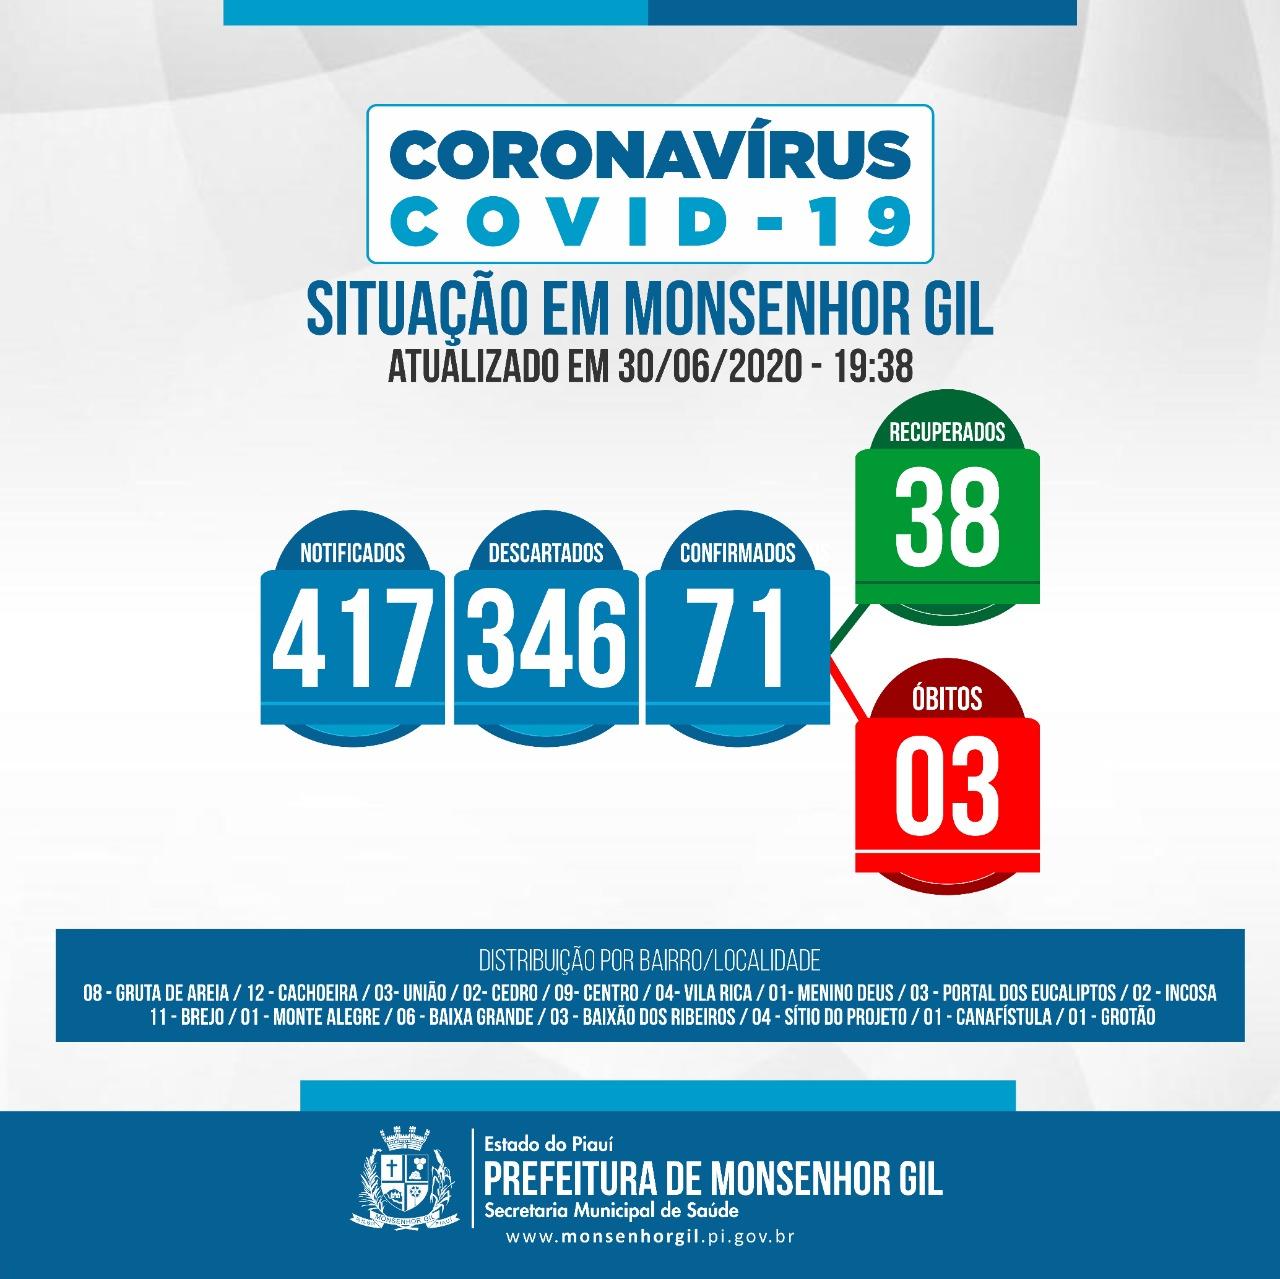 Prefeito João Luiz testa positivo para novo Coronavirus - Imagem 4